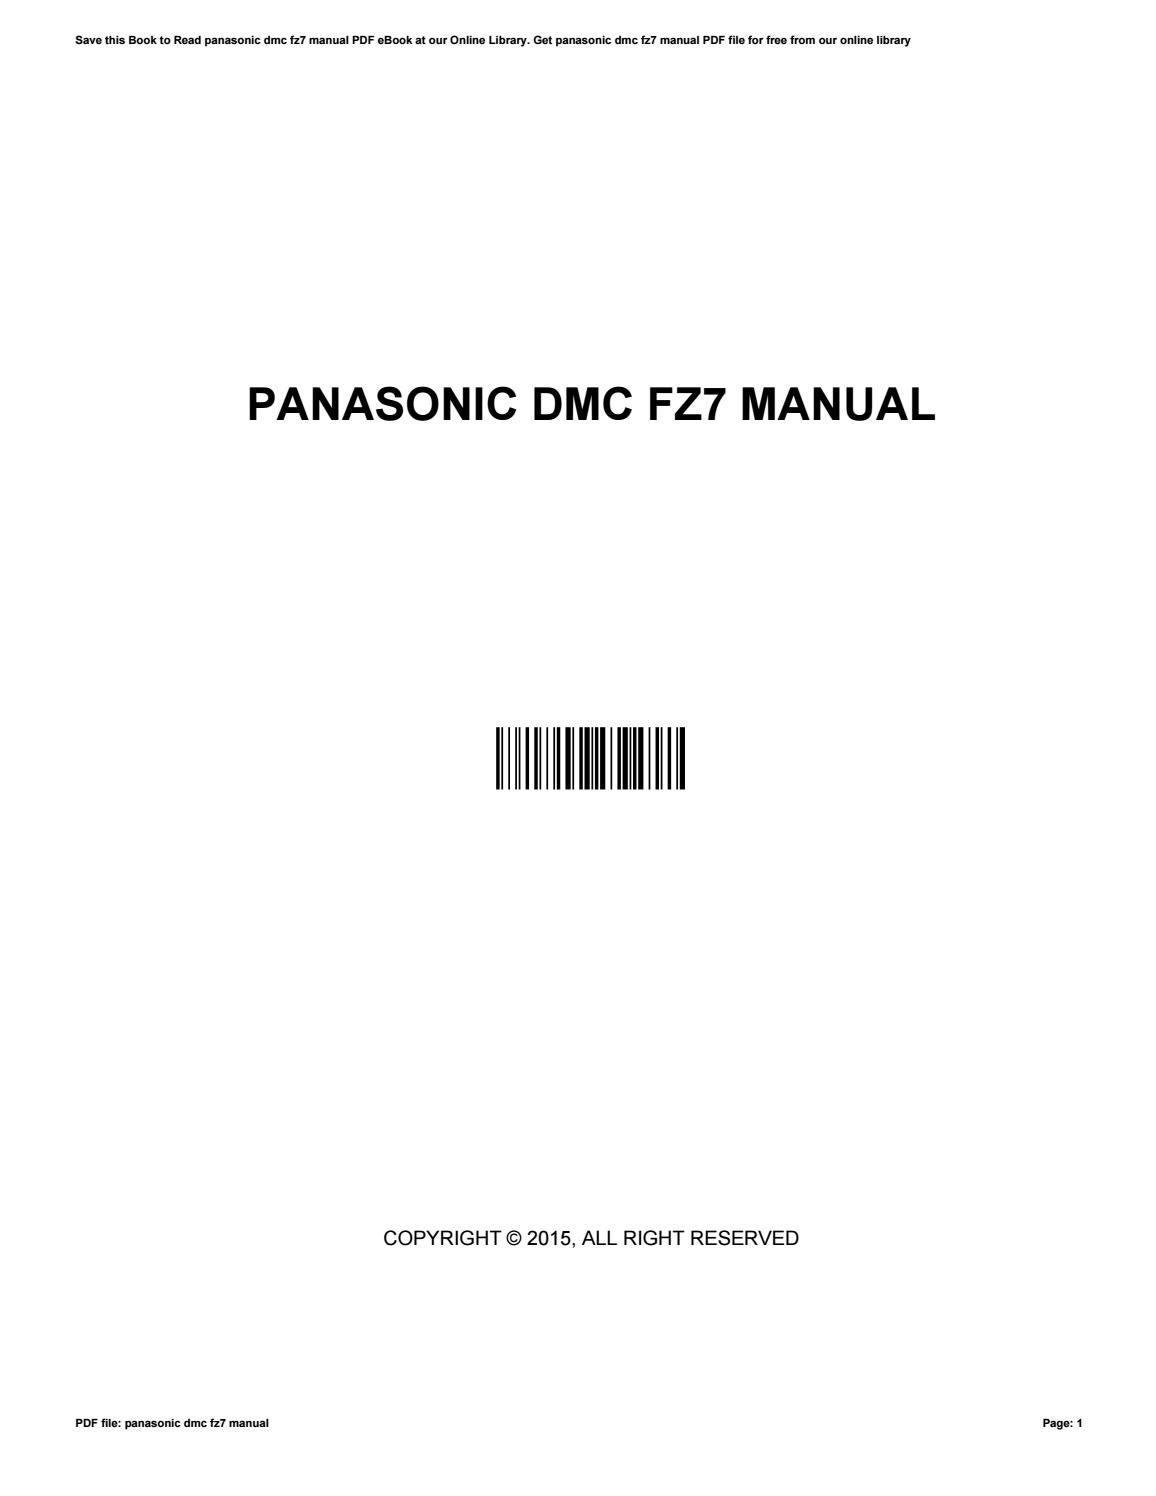 Panasonic technical manuals ebook array panasonic dmc fz7 manual by sergiohale3352 issuu rh issuu fandeluxe Gallery